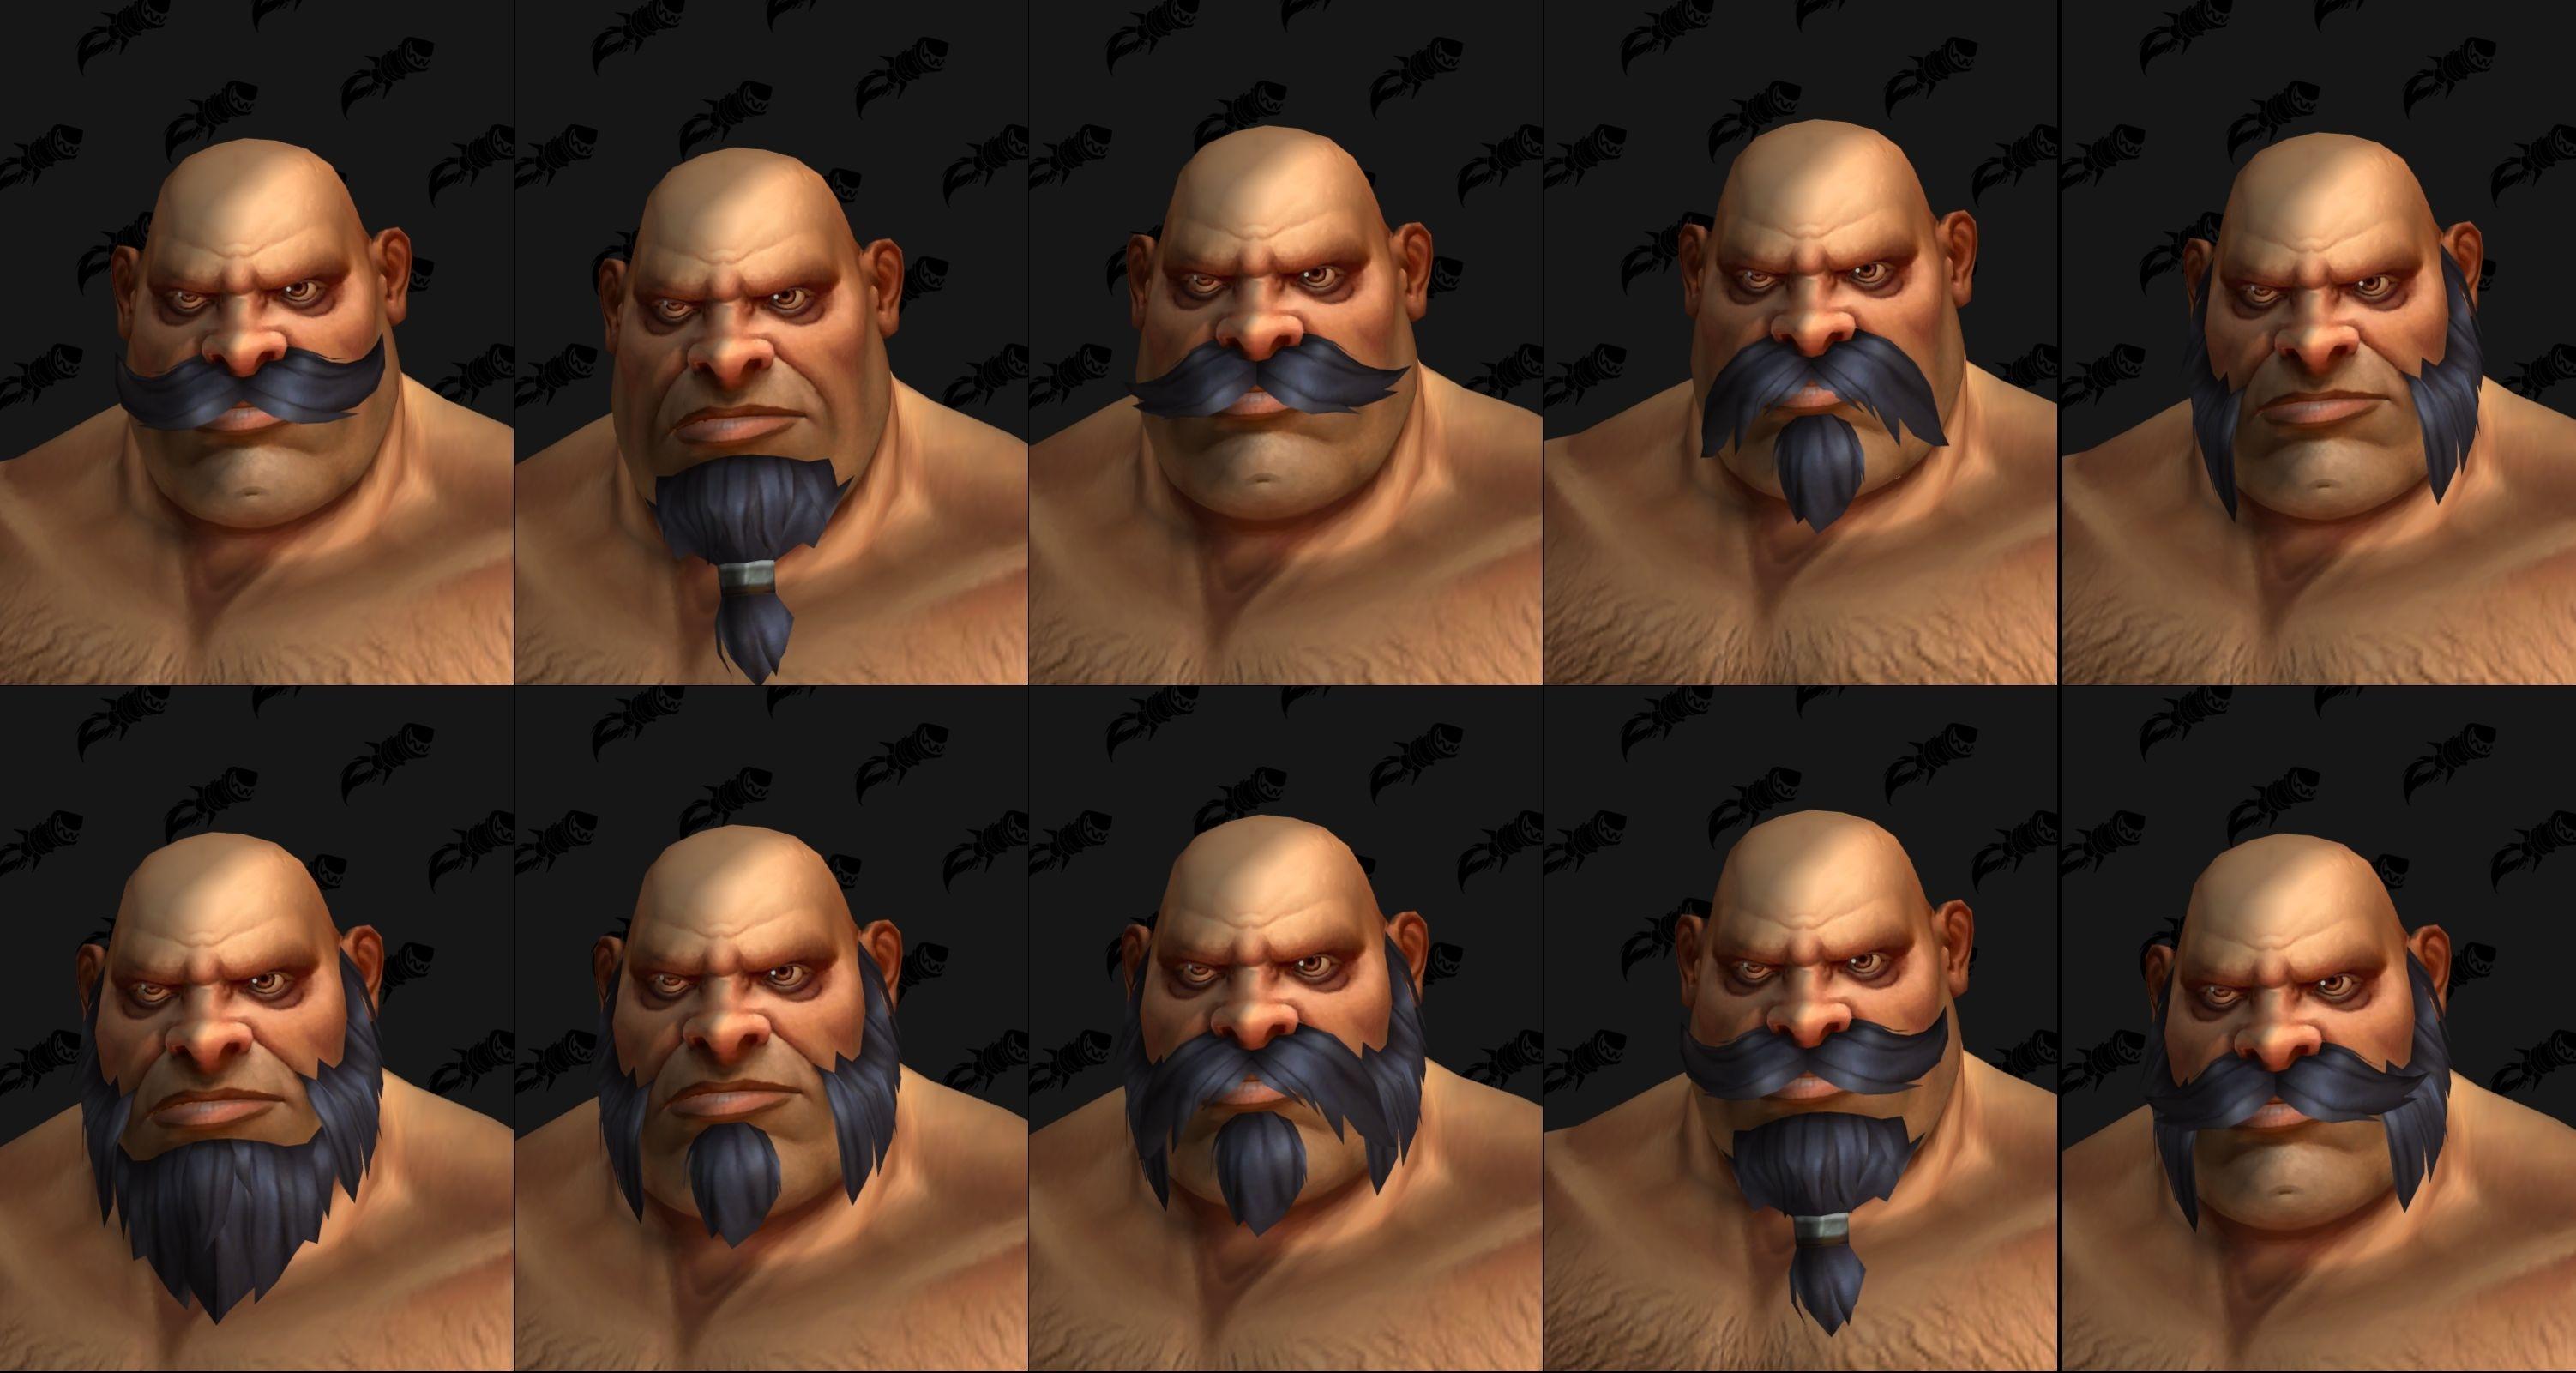 World Of Warcraft S Next Allied Race Could Be Kul Tiran